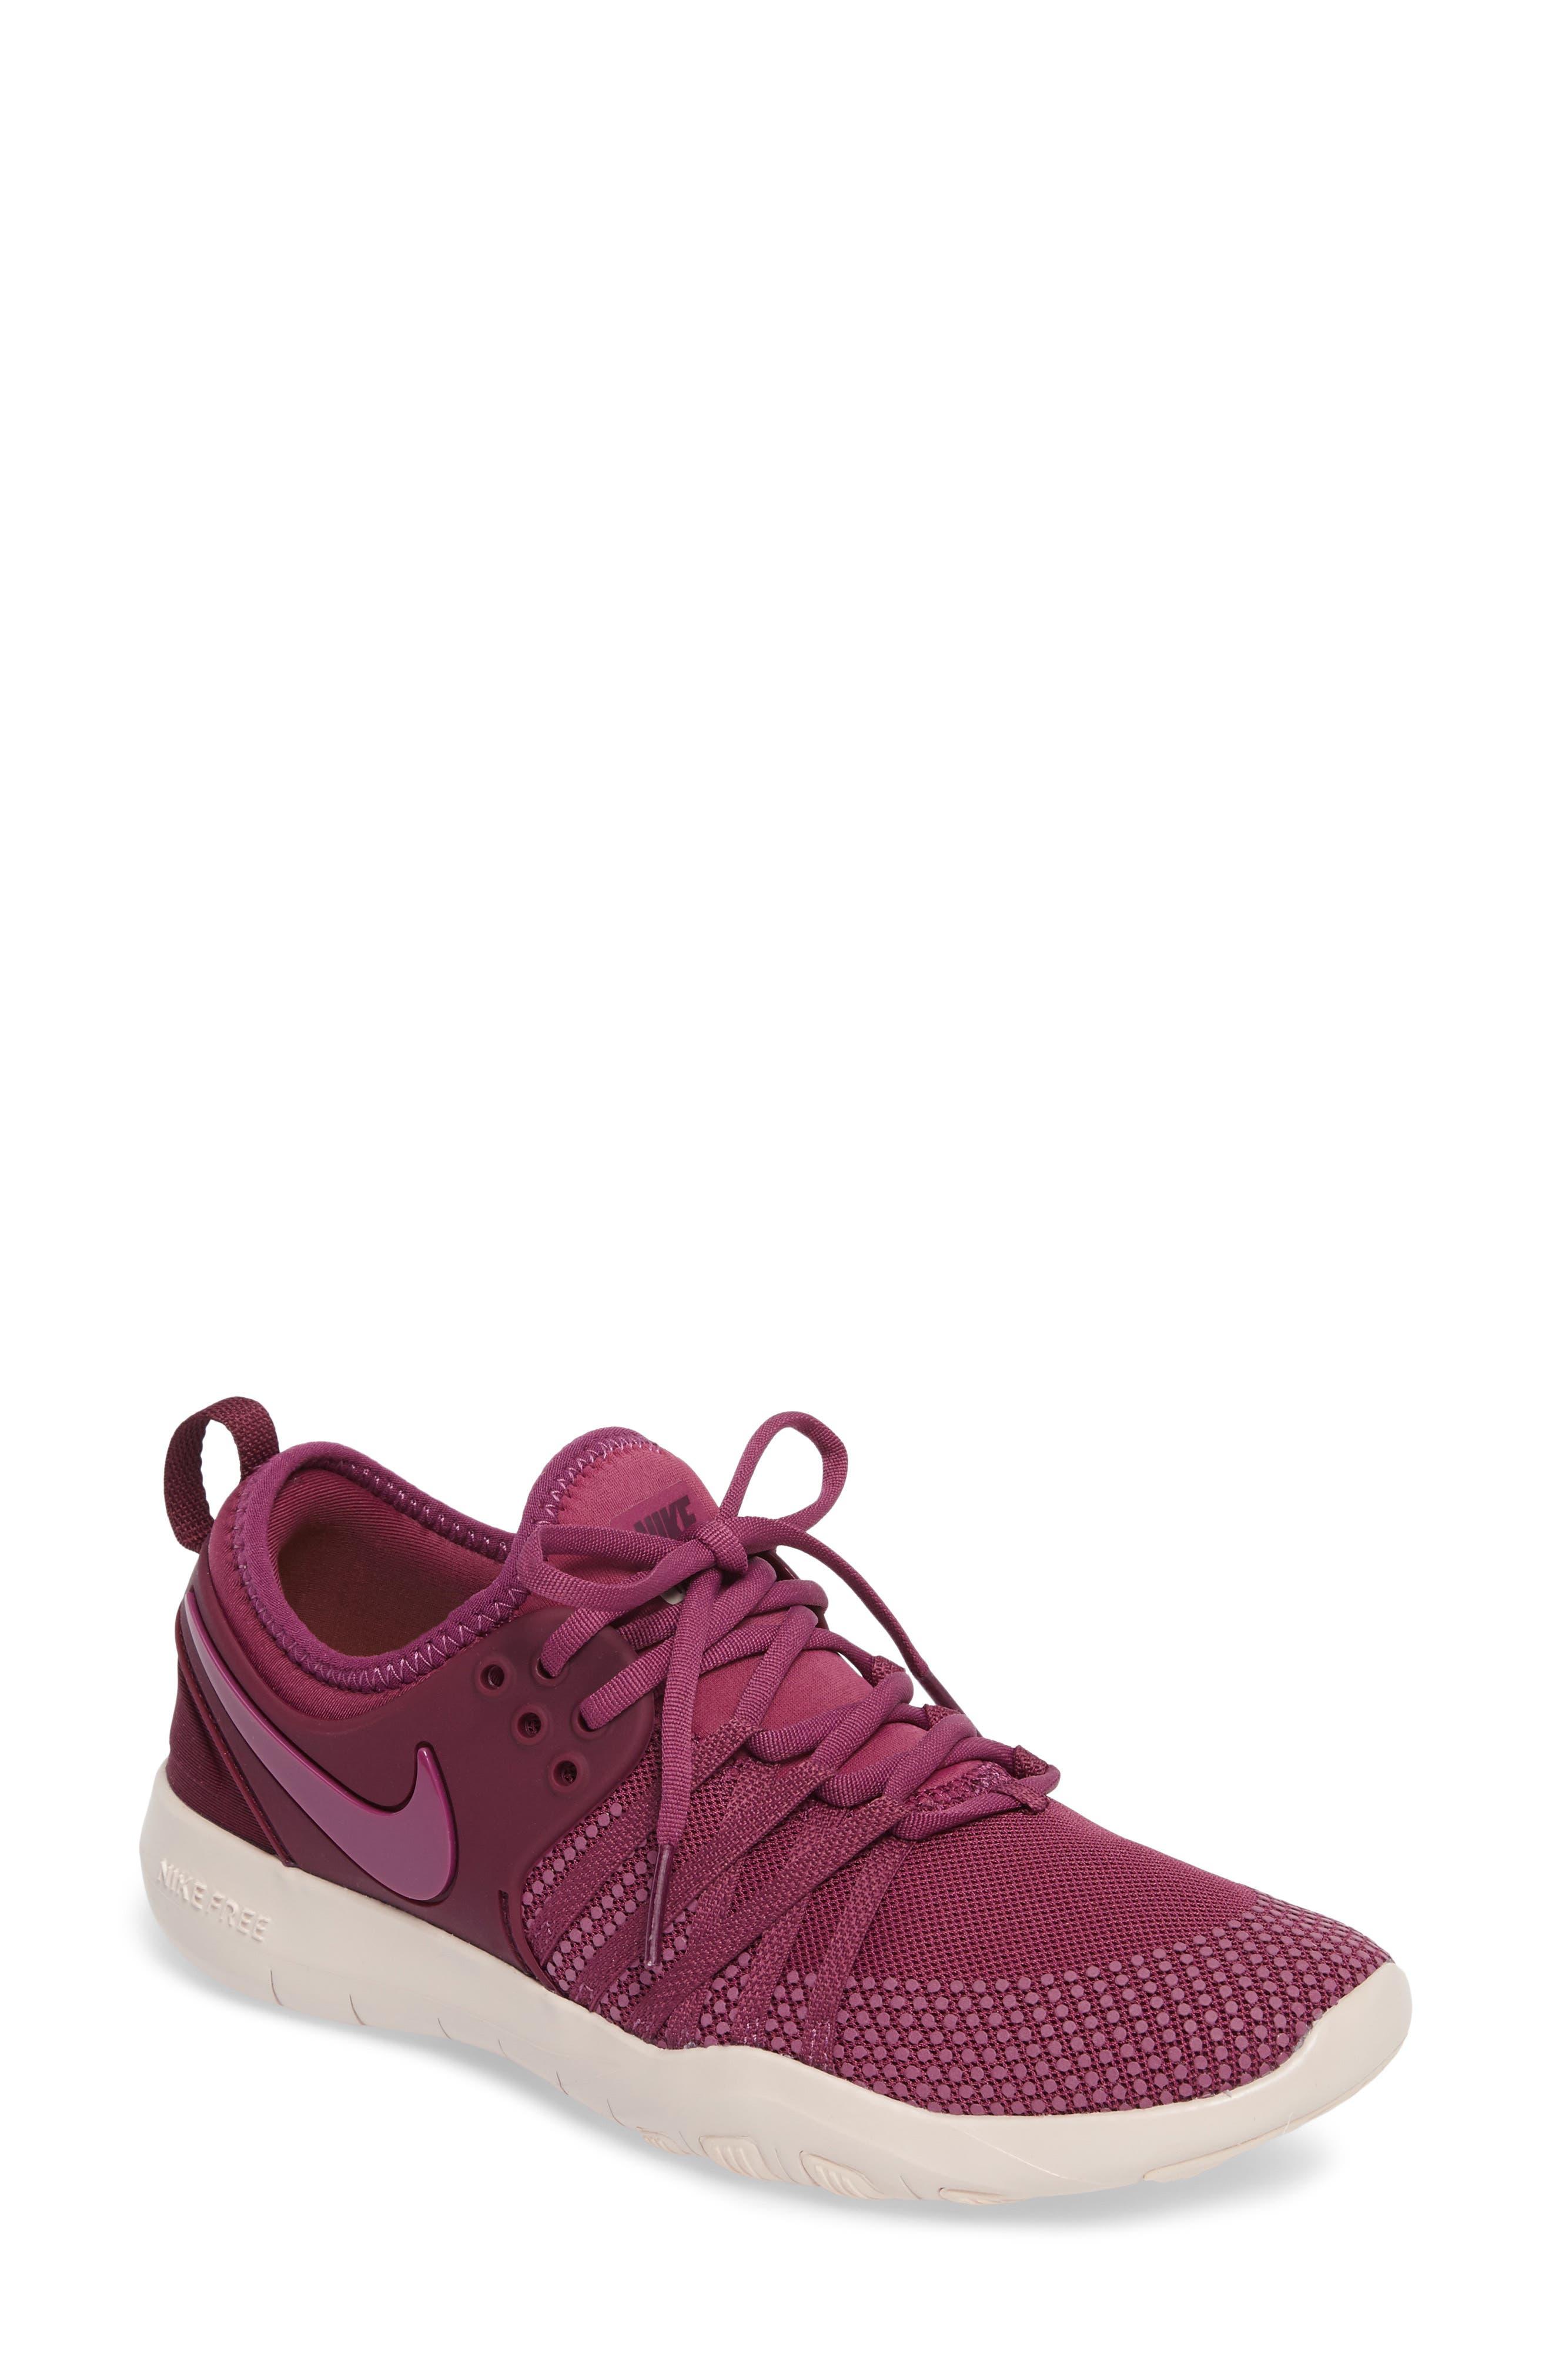 Main Image - Nike Free TR 7 Training Shoe (Women)